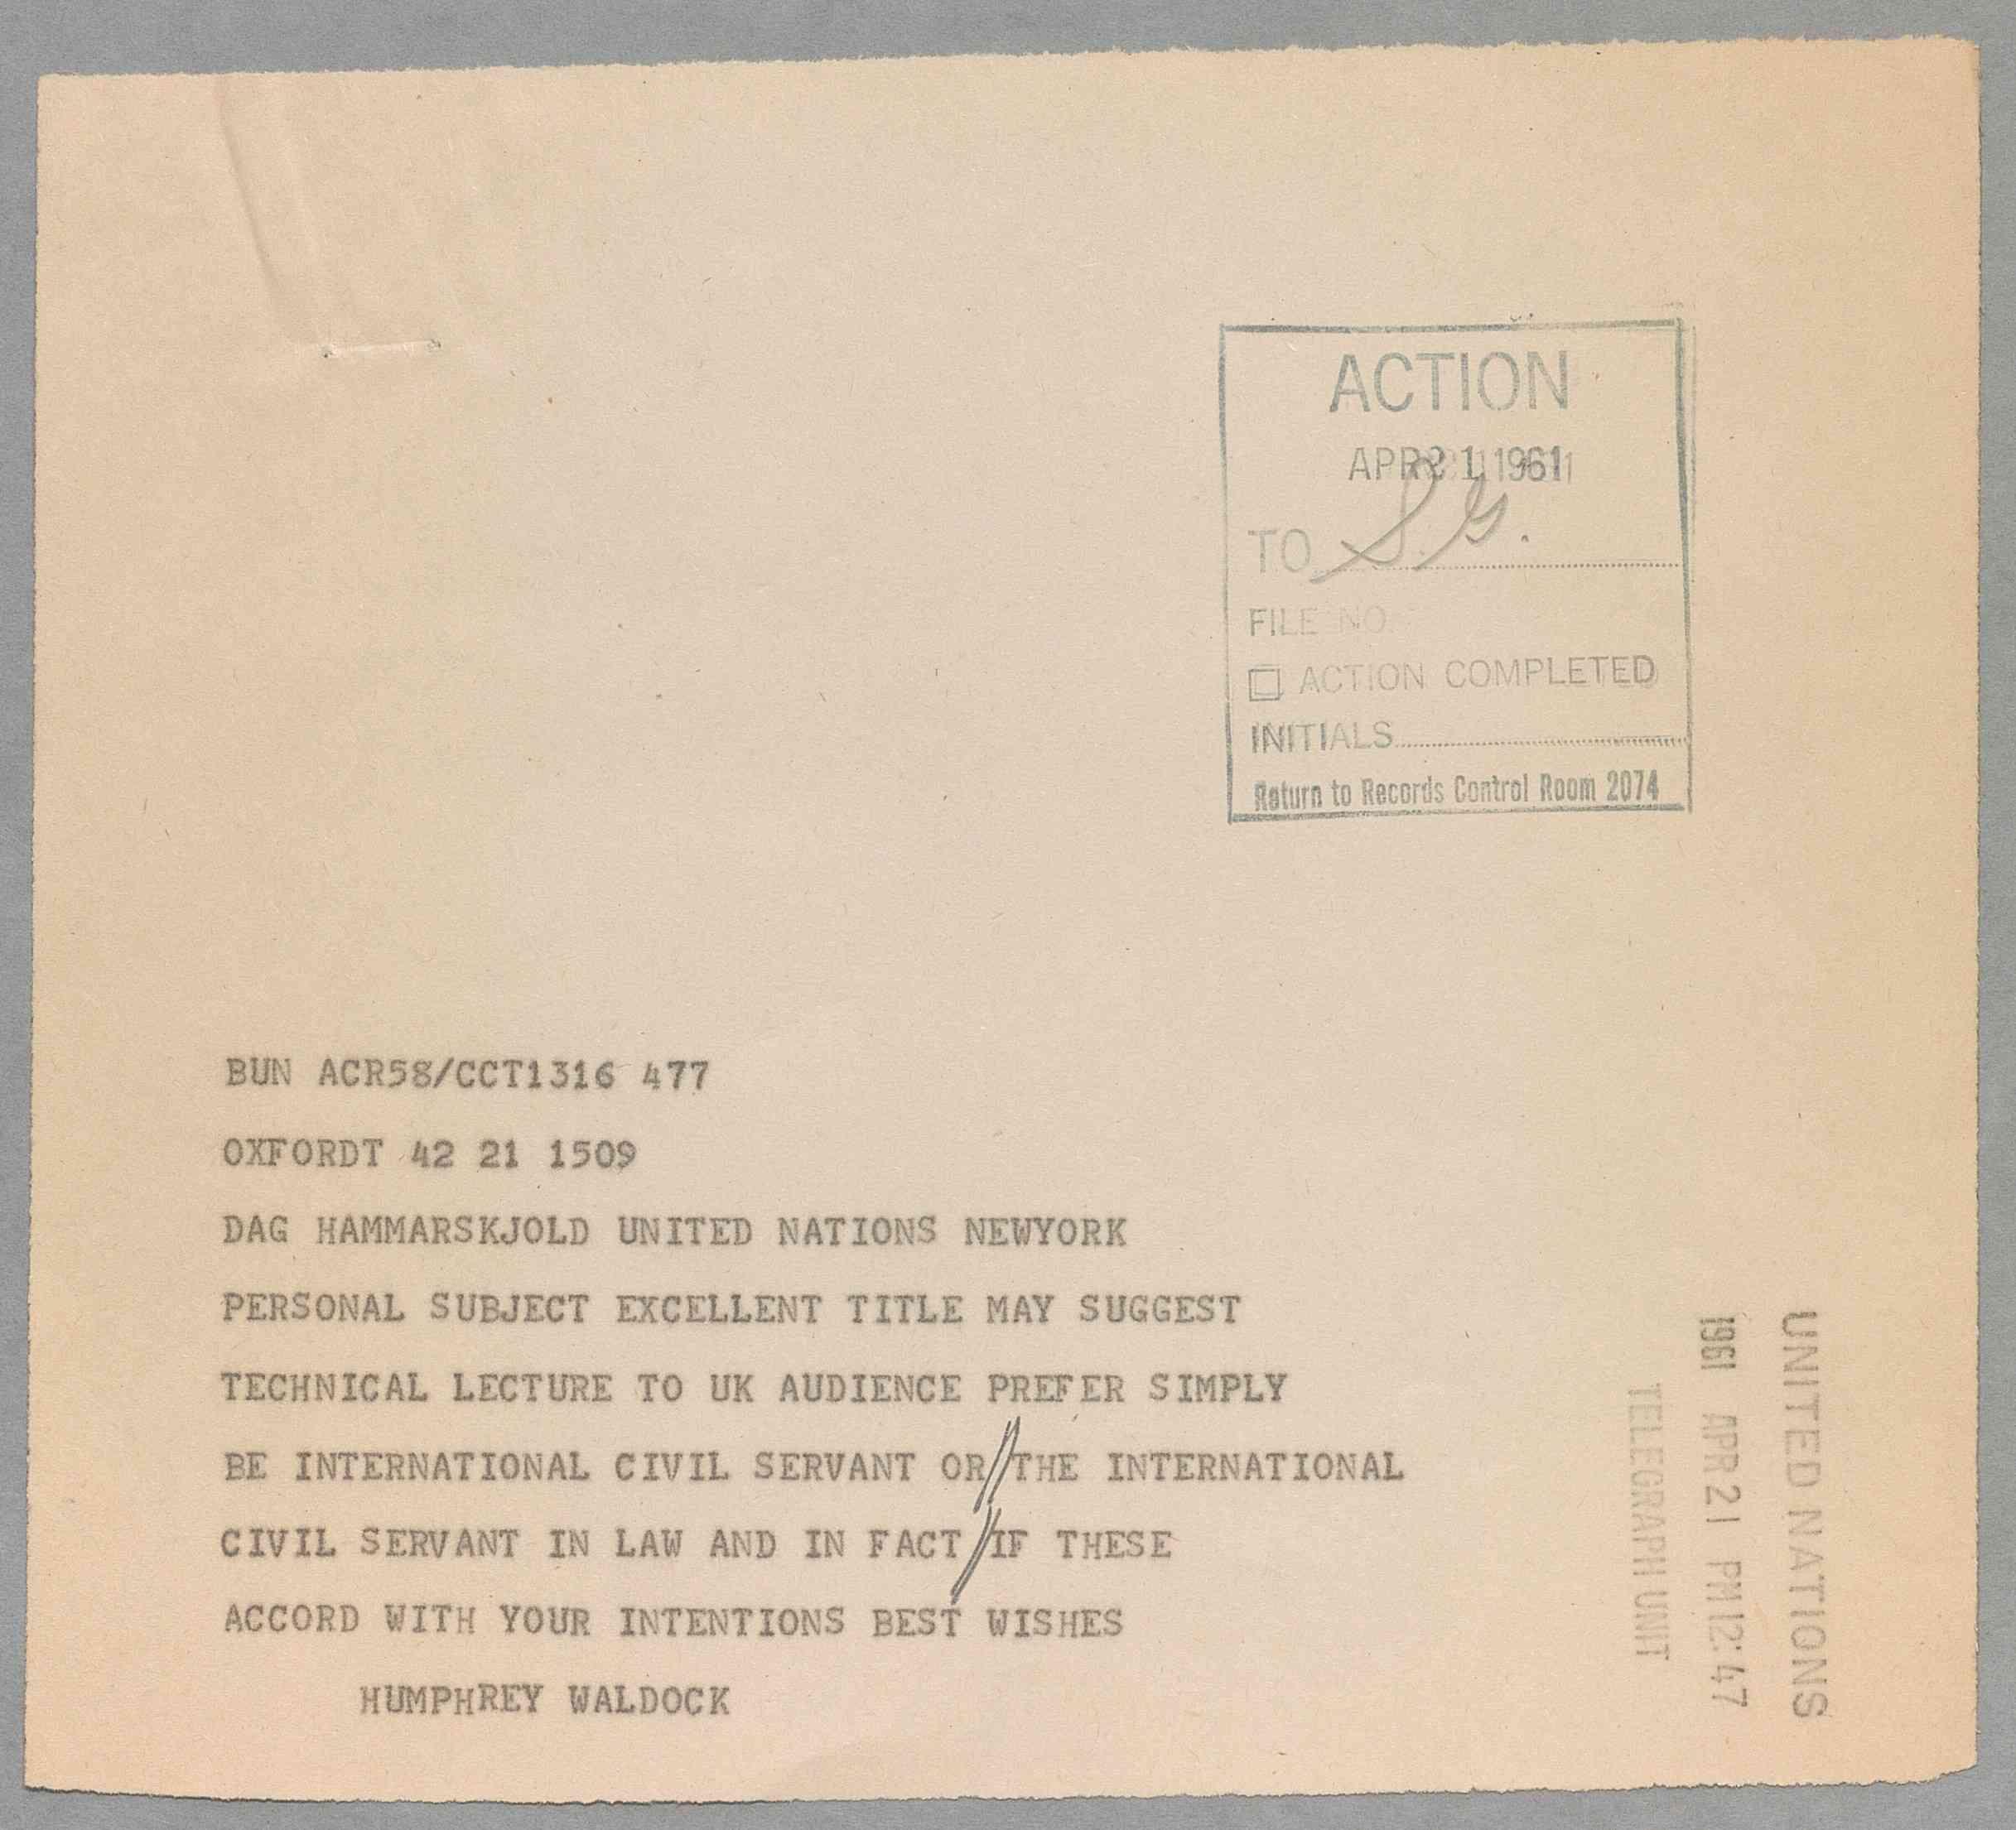 A reproduction of a telegram from Sir Humphrey Waldock to Dag Hammarskjöld sent on 21 April 1961.